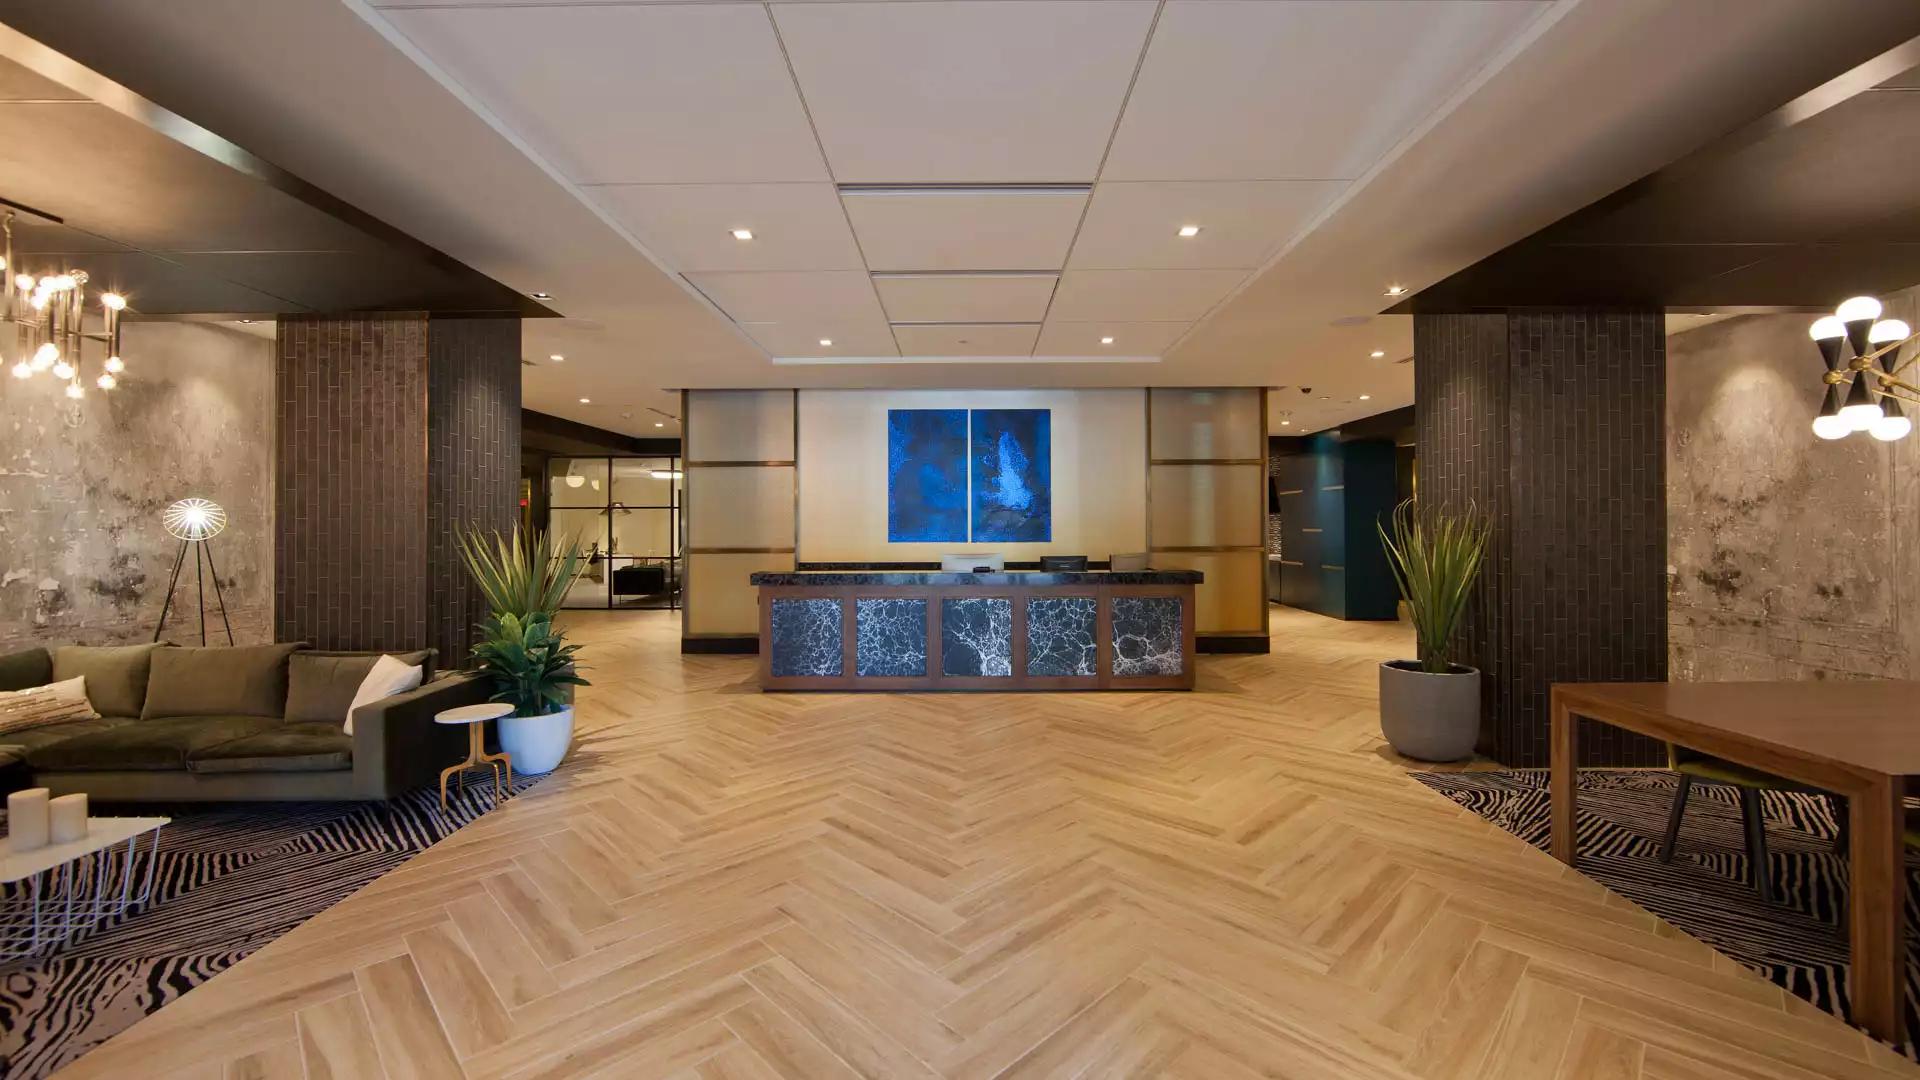 2201 Wilson Apartments - Arlington, VA